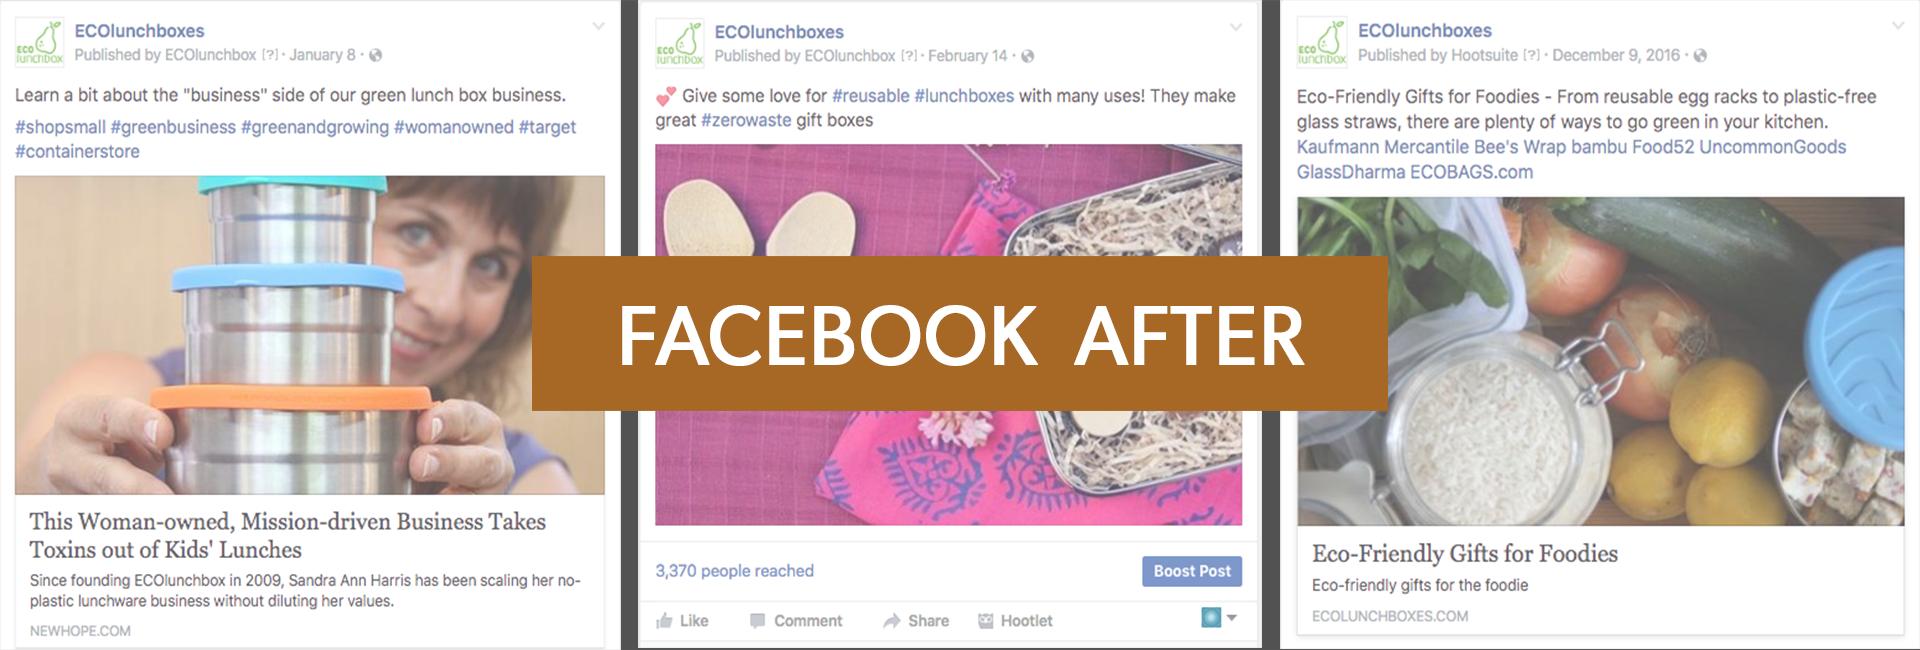 ecolunchbox_facebook_after